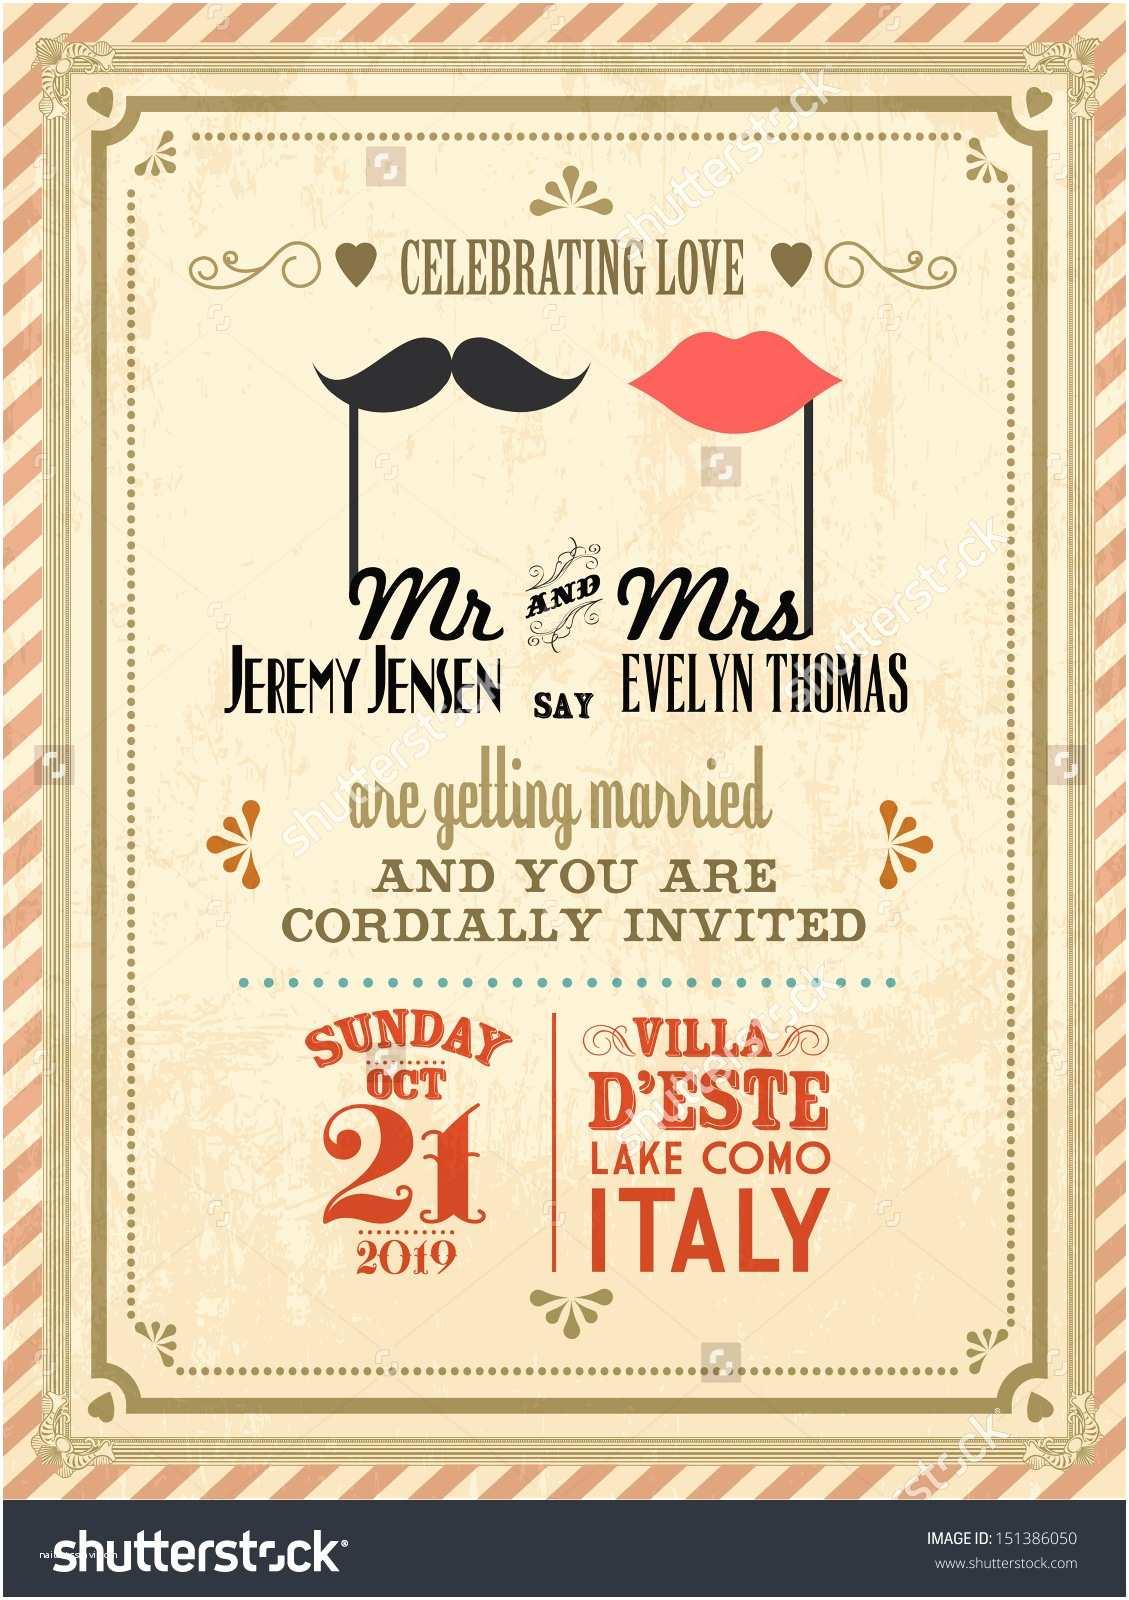 Create Your Own Wedding Invitations Vintage Wedding Invitation Templates